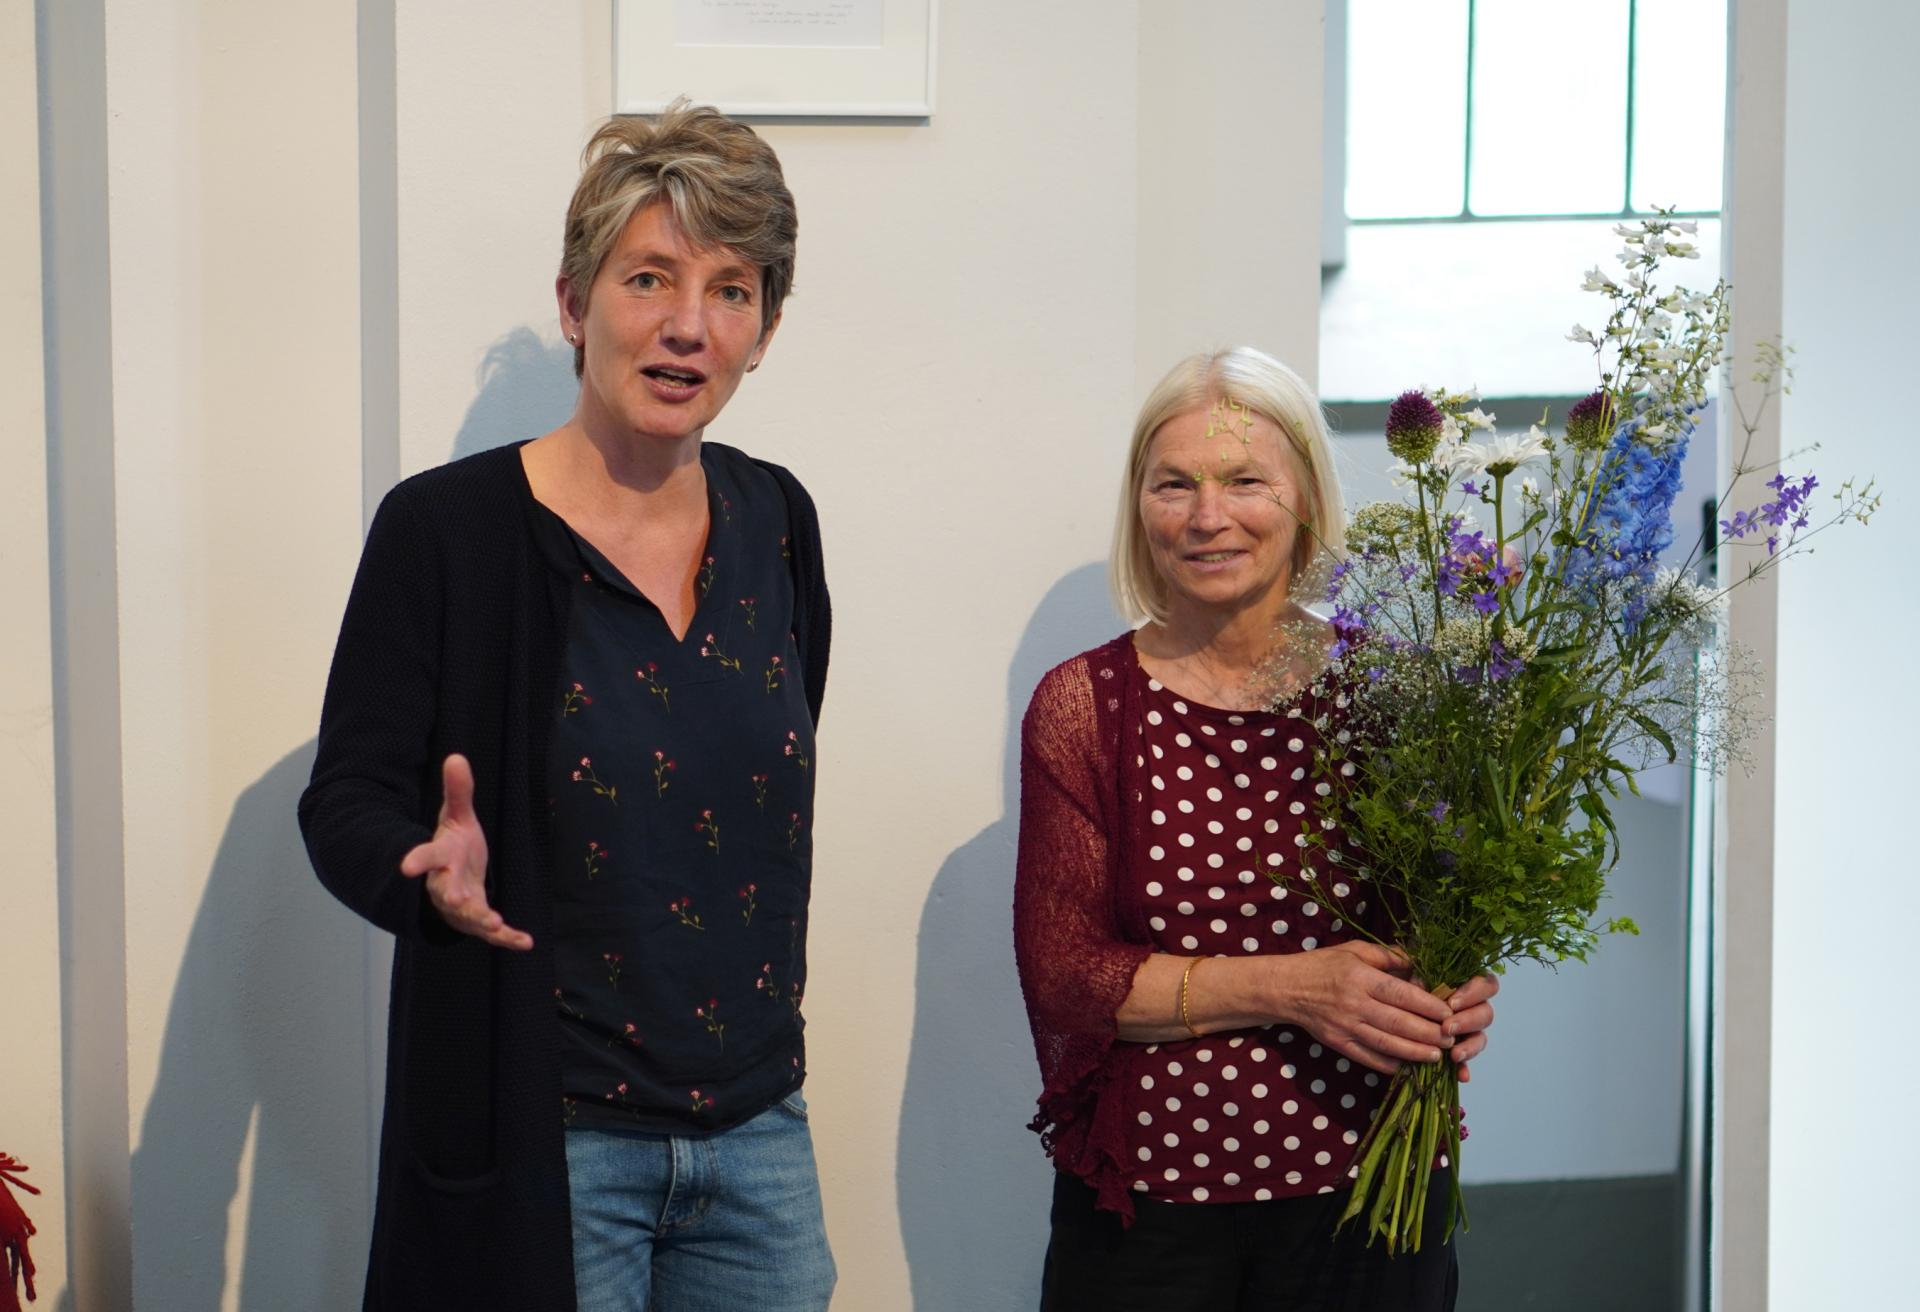 Marie Sander folgt auf Christiane Giese